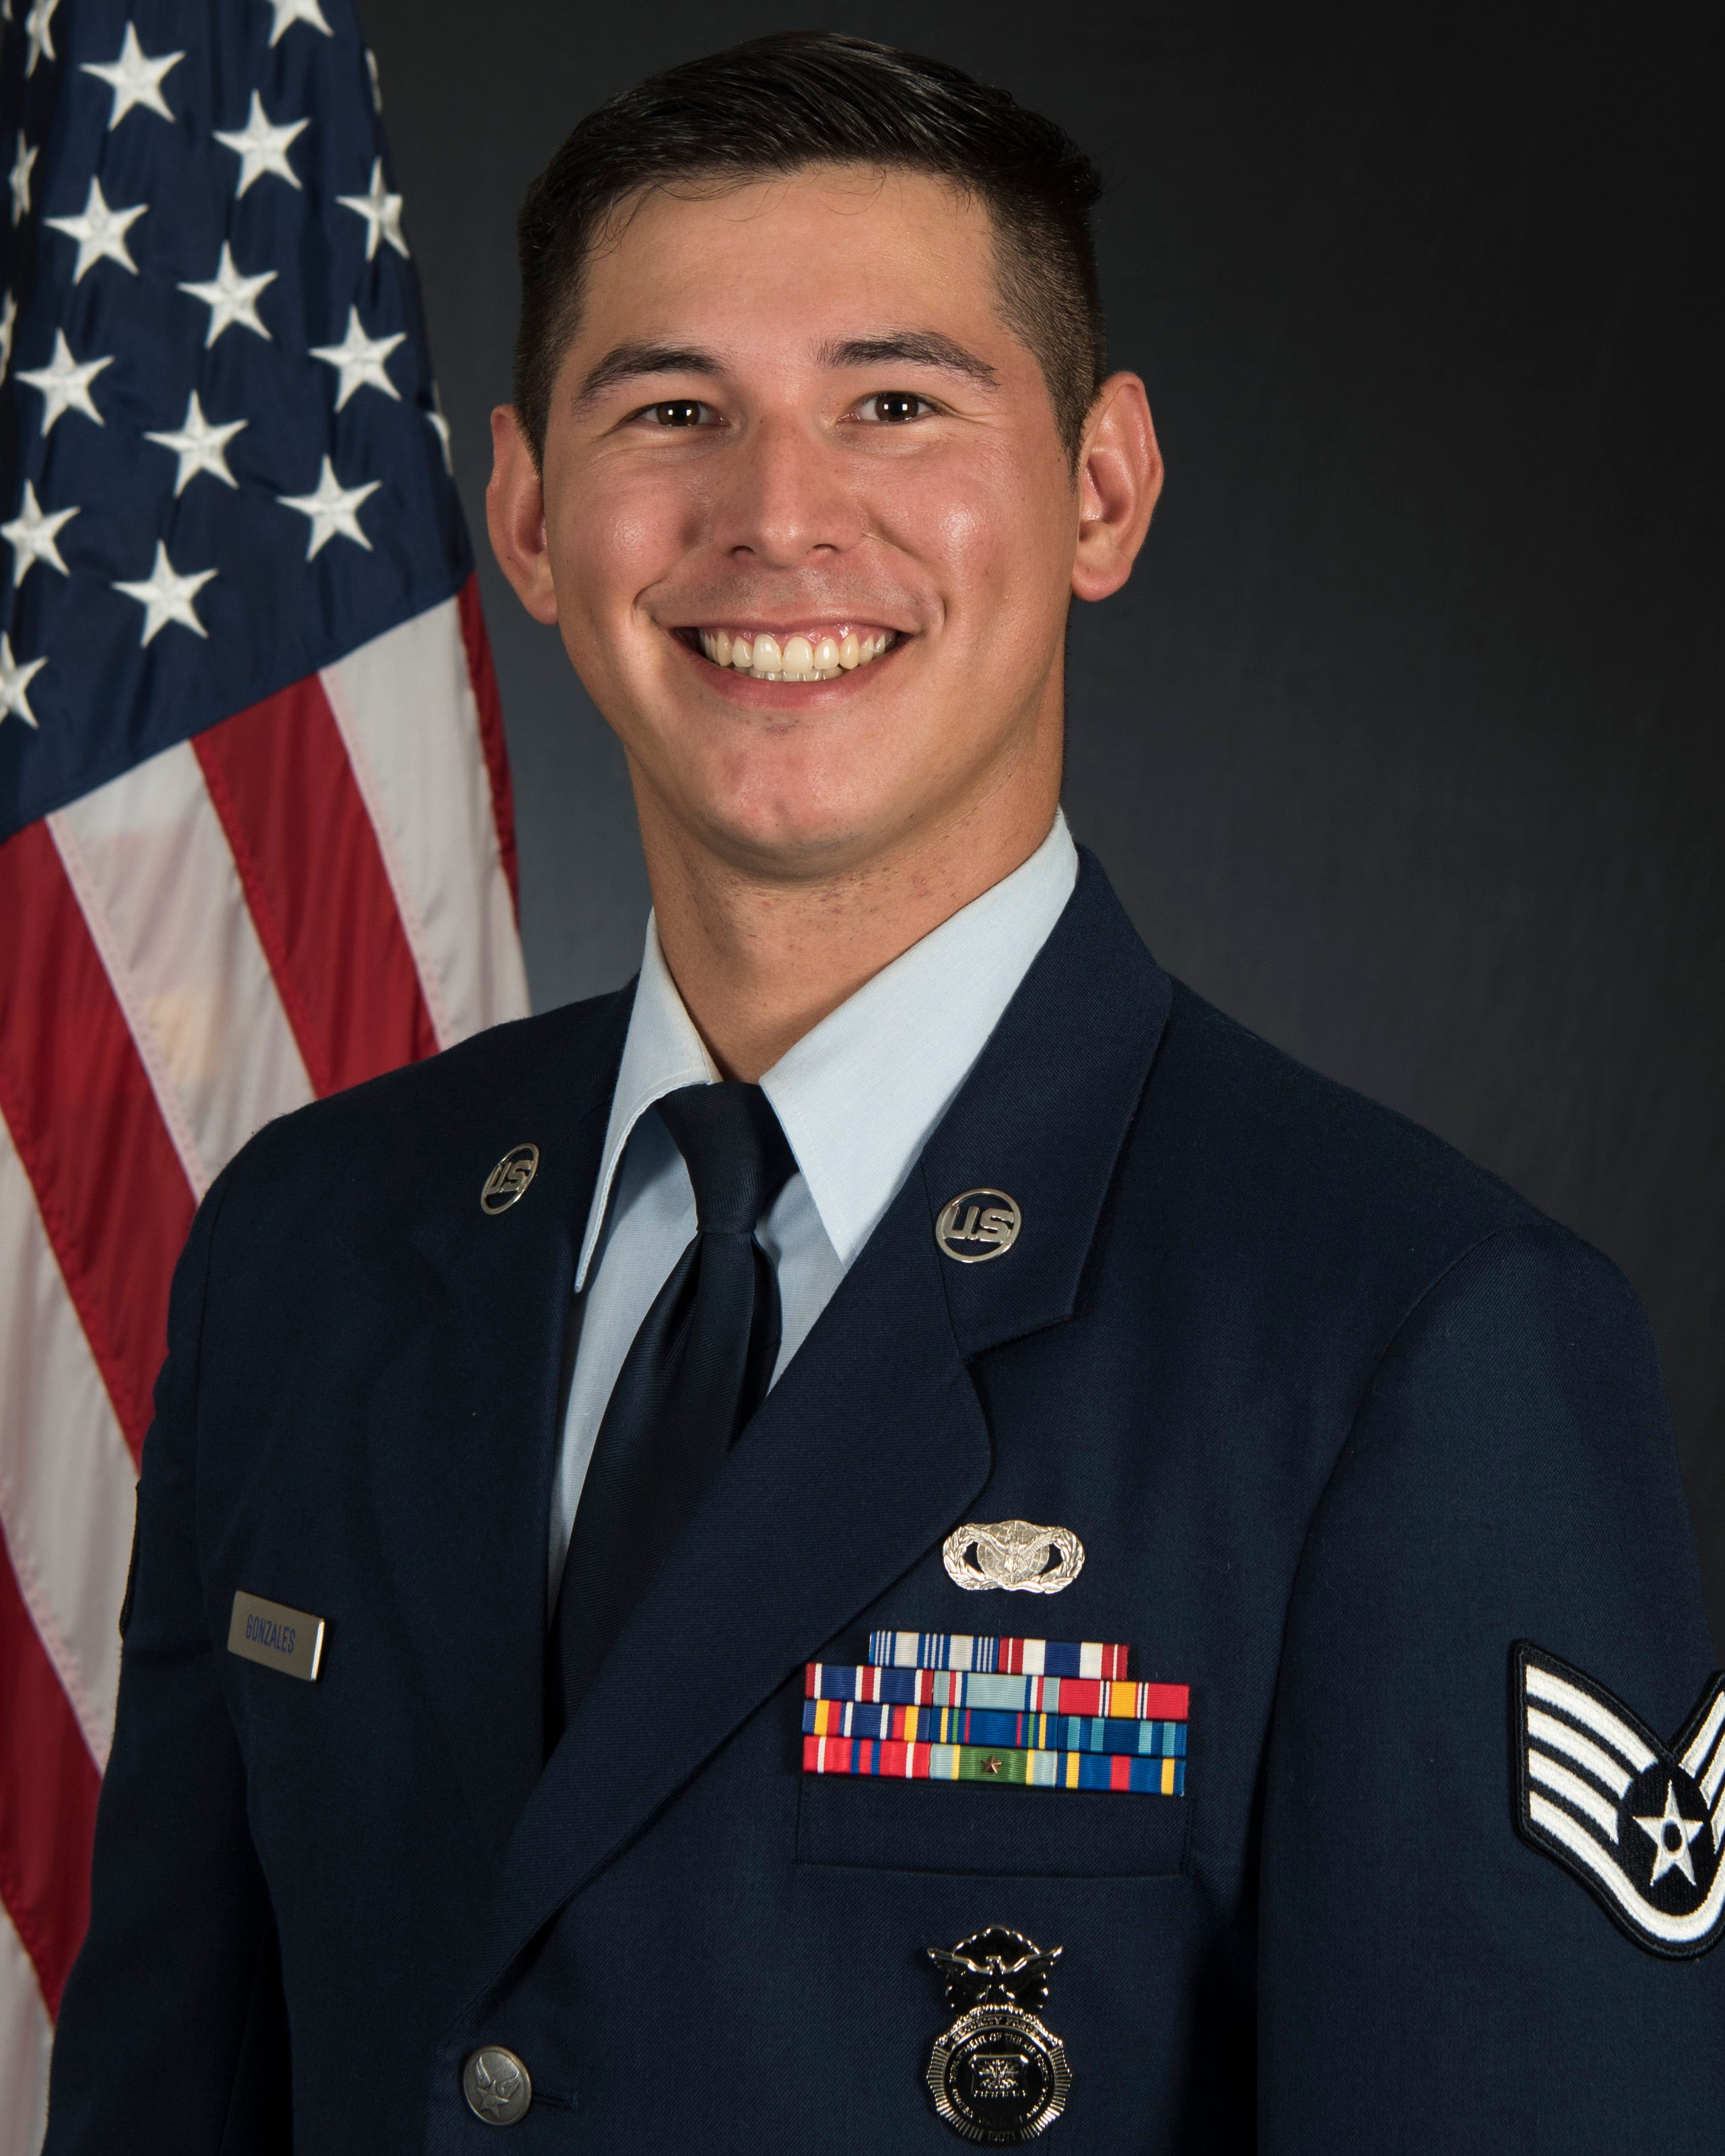 Staff Sgt. Will S. Gonzales